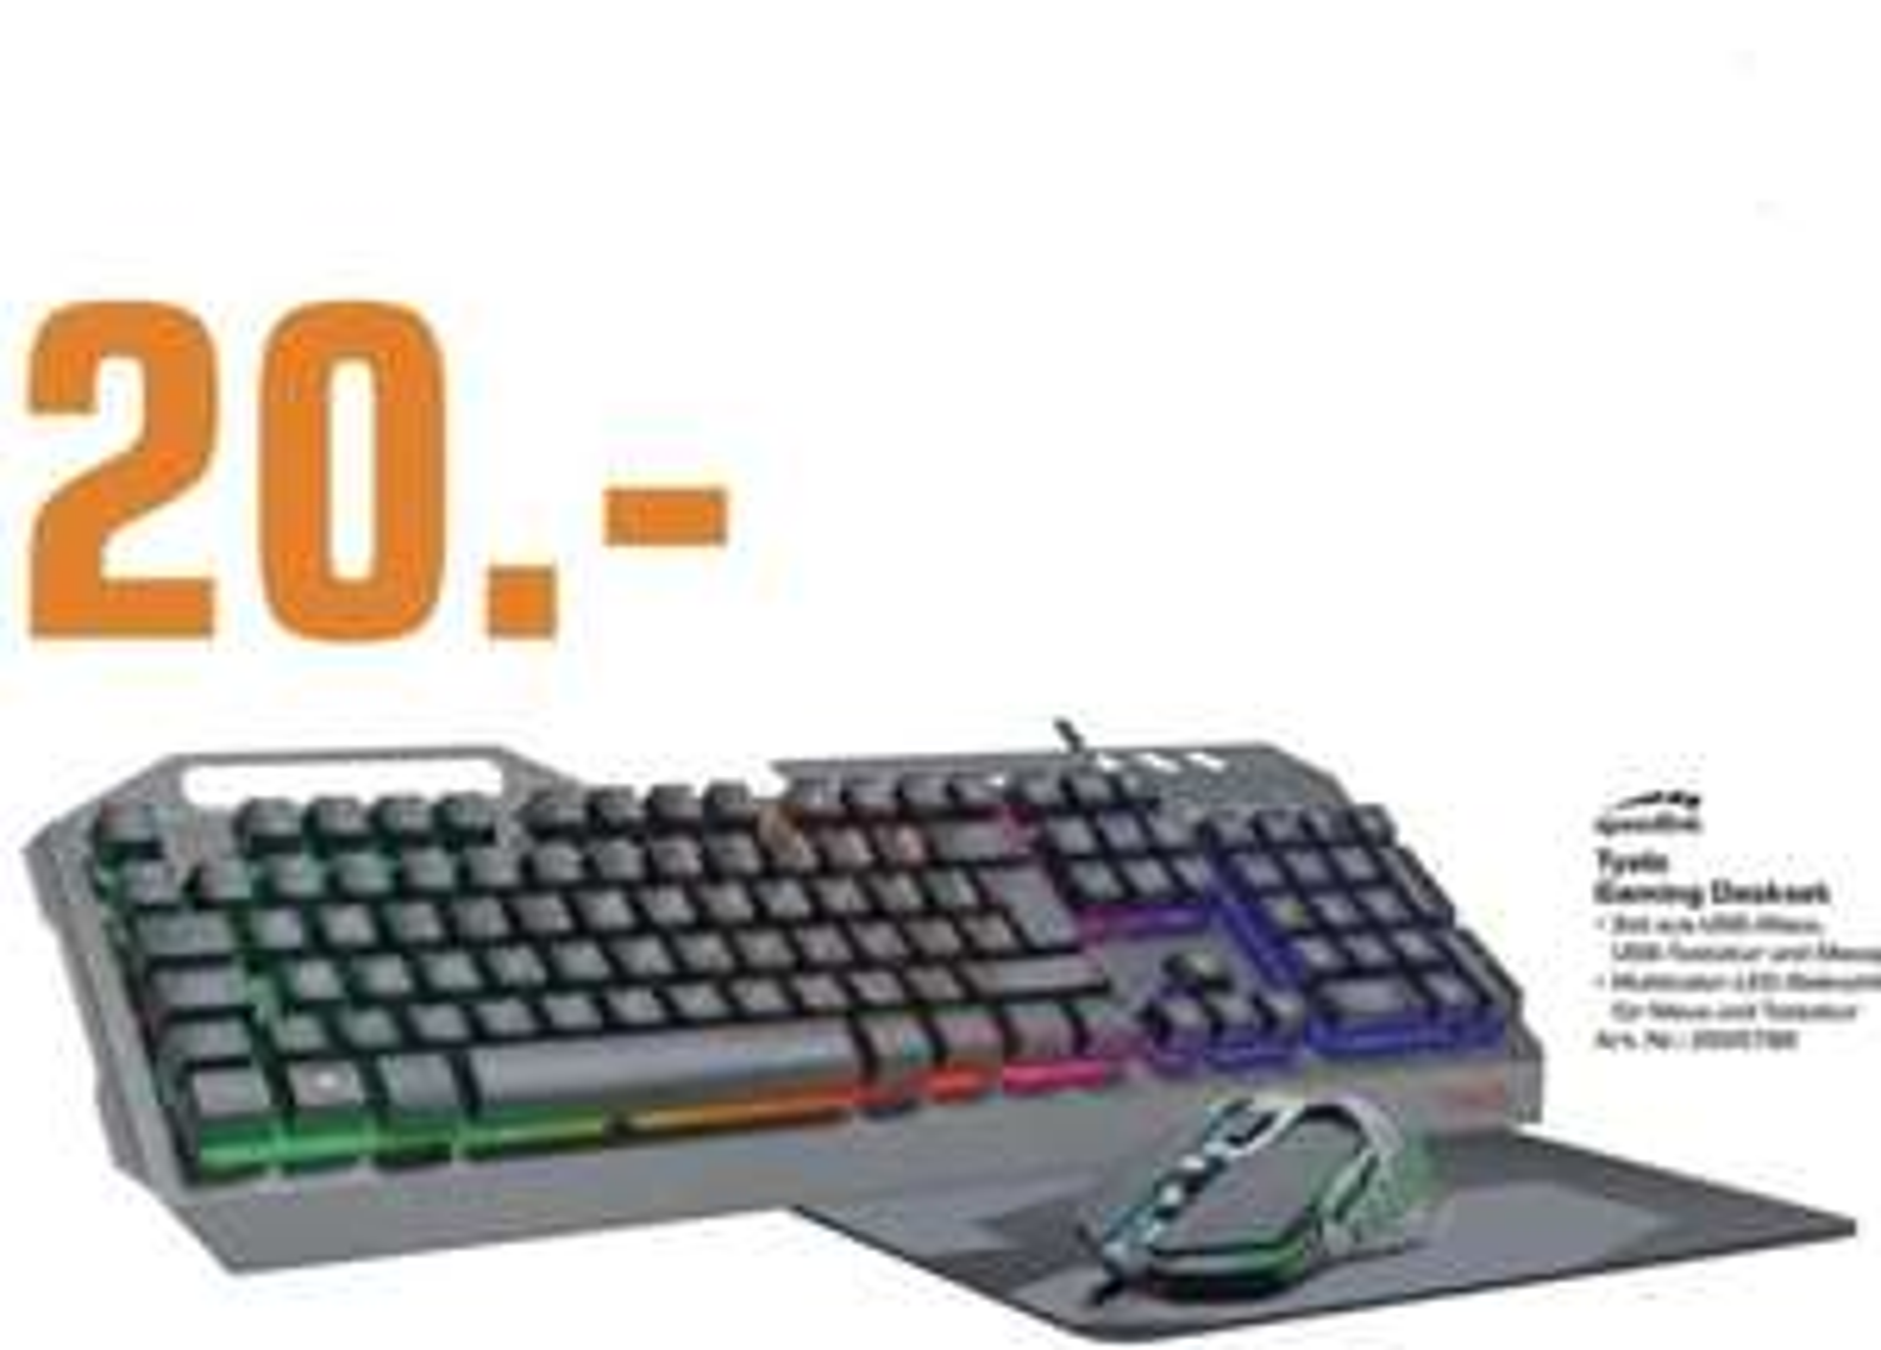 Lokal Saturn Berlin: Speedlink TYALO Gaming Set mit LED-Multicolor Beleuchtung USB-Tastatur + USB-Maus + Mauspad für 20€